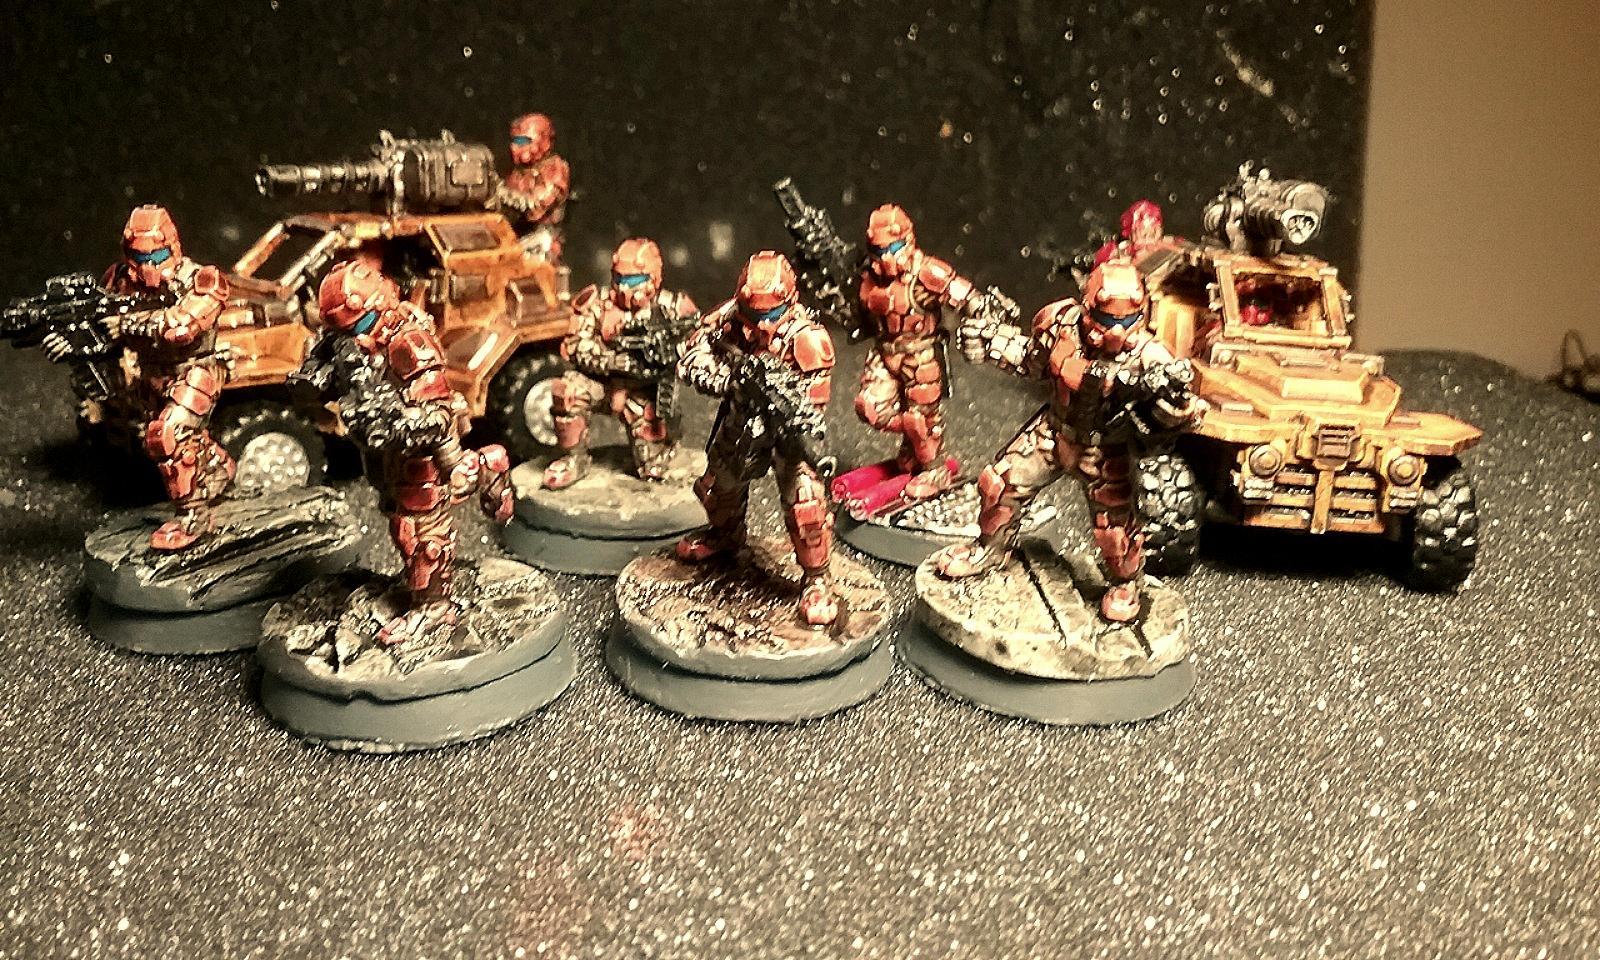 Afterlife, Instigator Assault Vehicles, Republic, Republic Commando, Republic Commandos